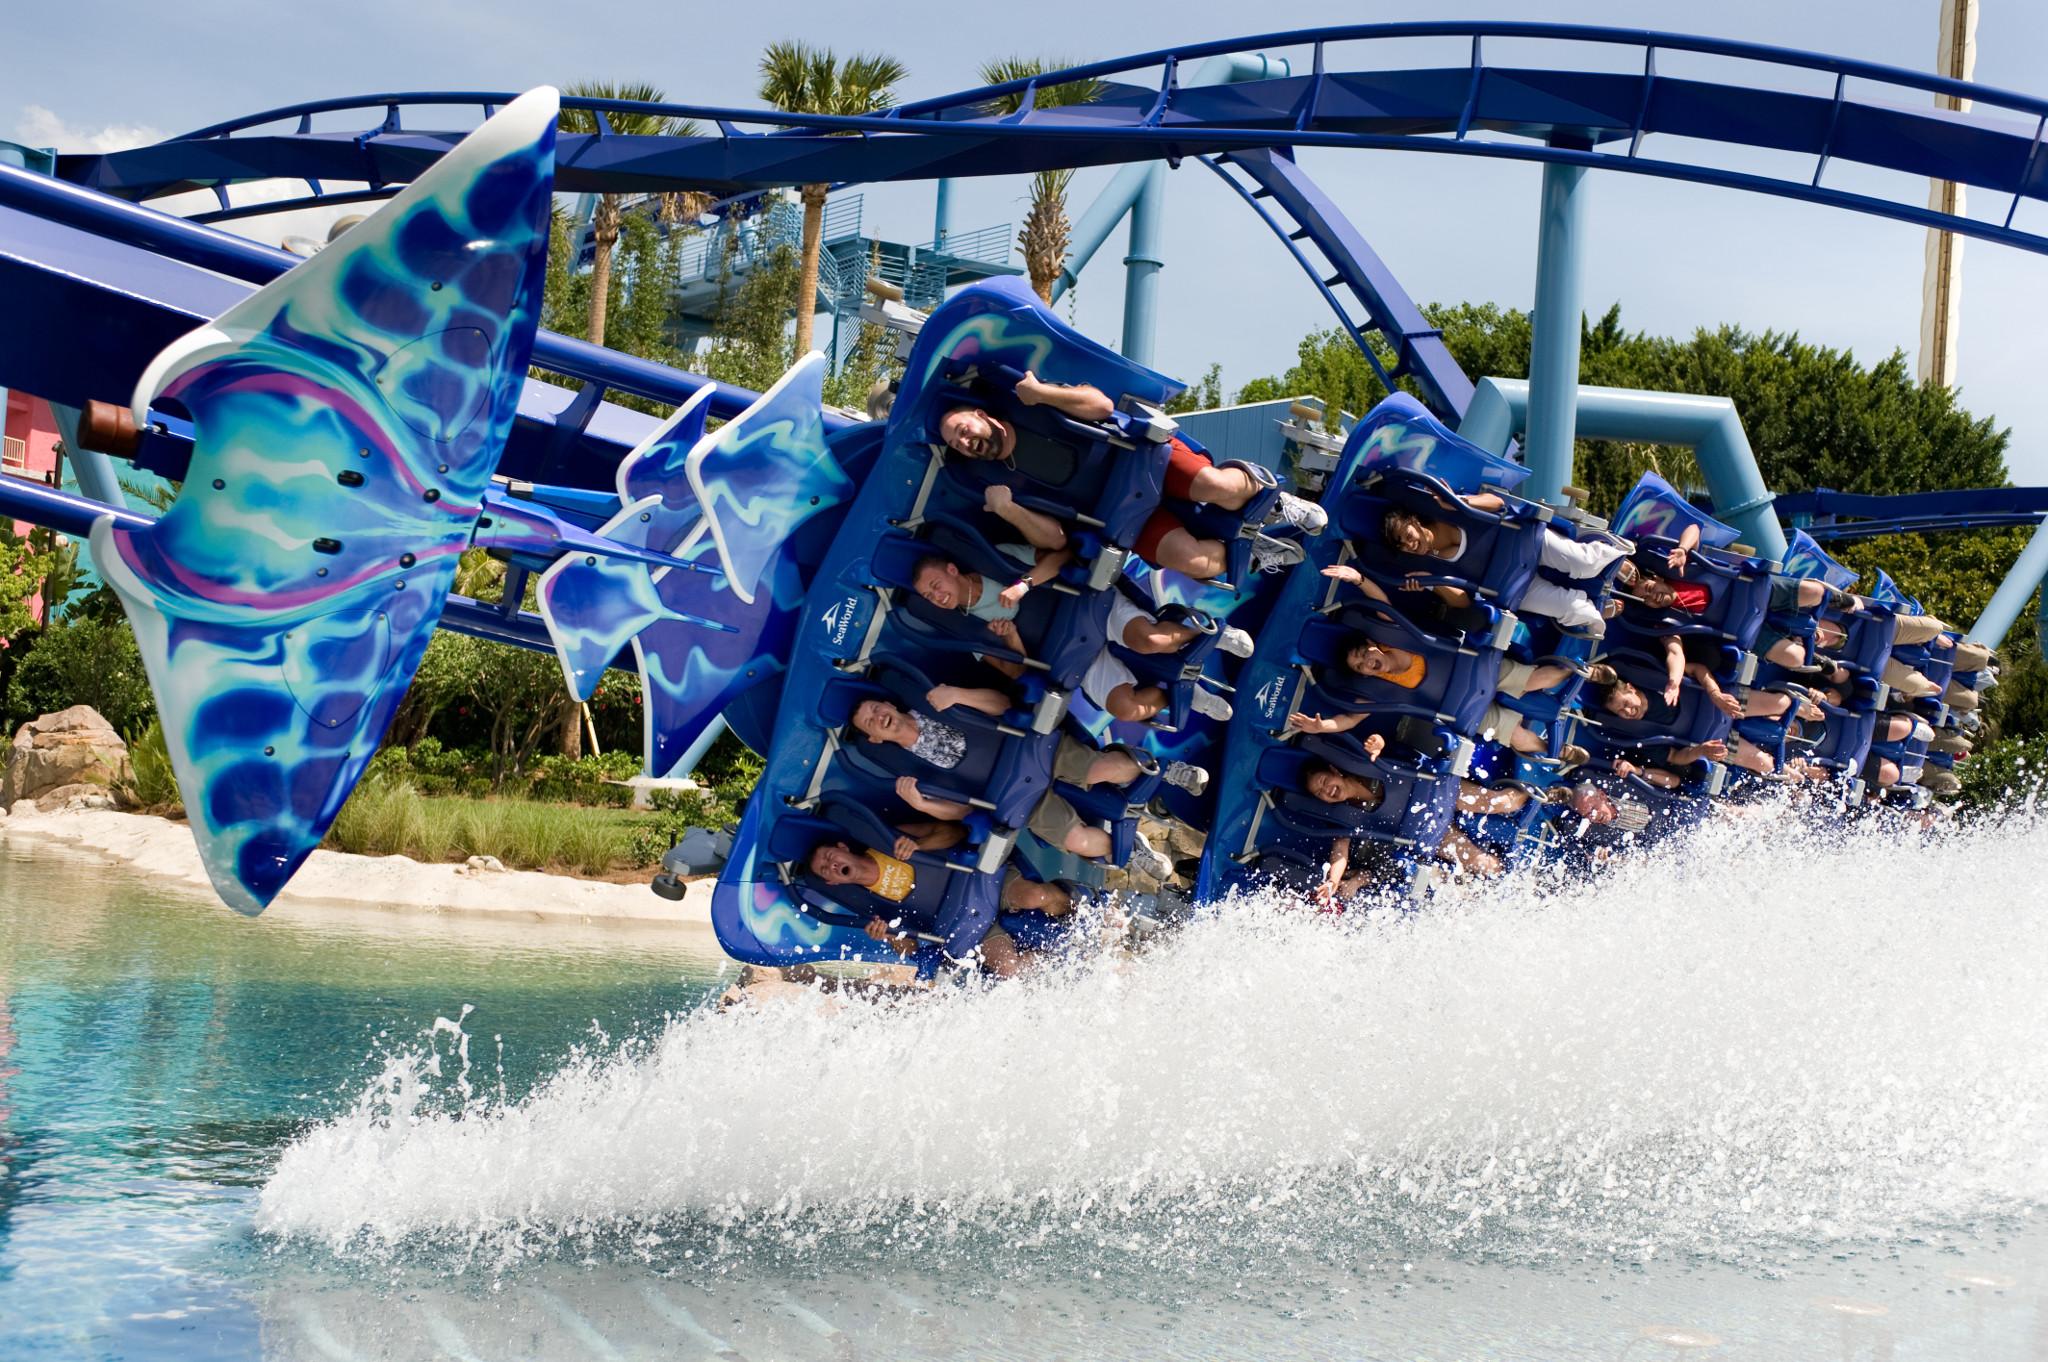 Manta roller coaster in action at SeaWorld Orlando.